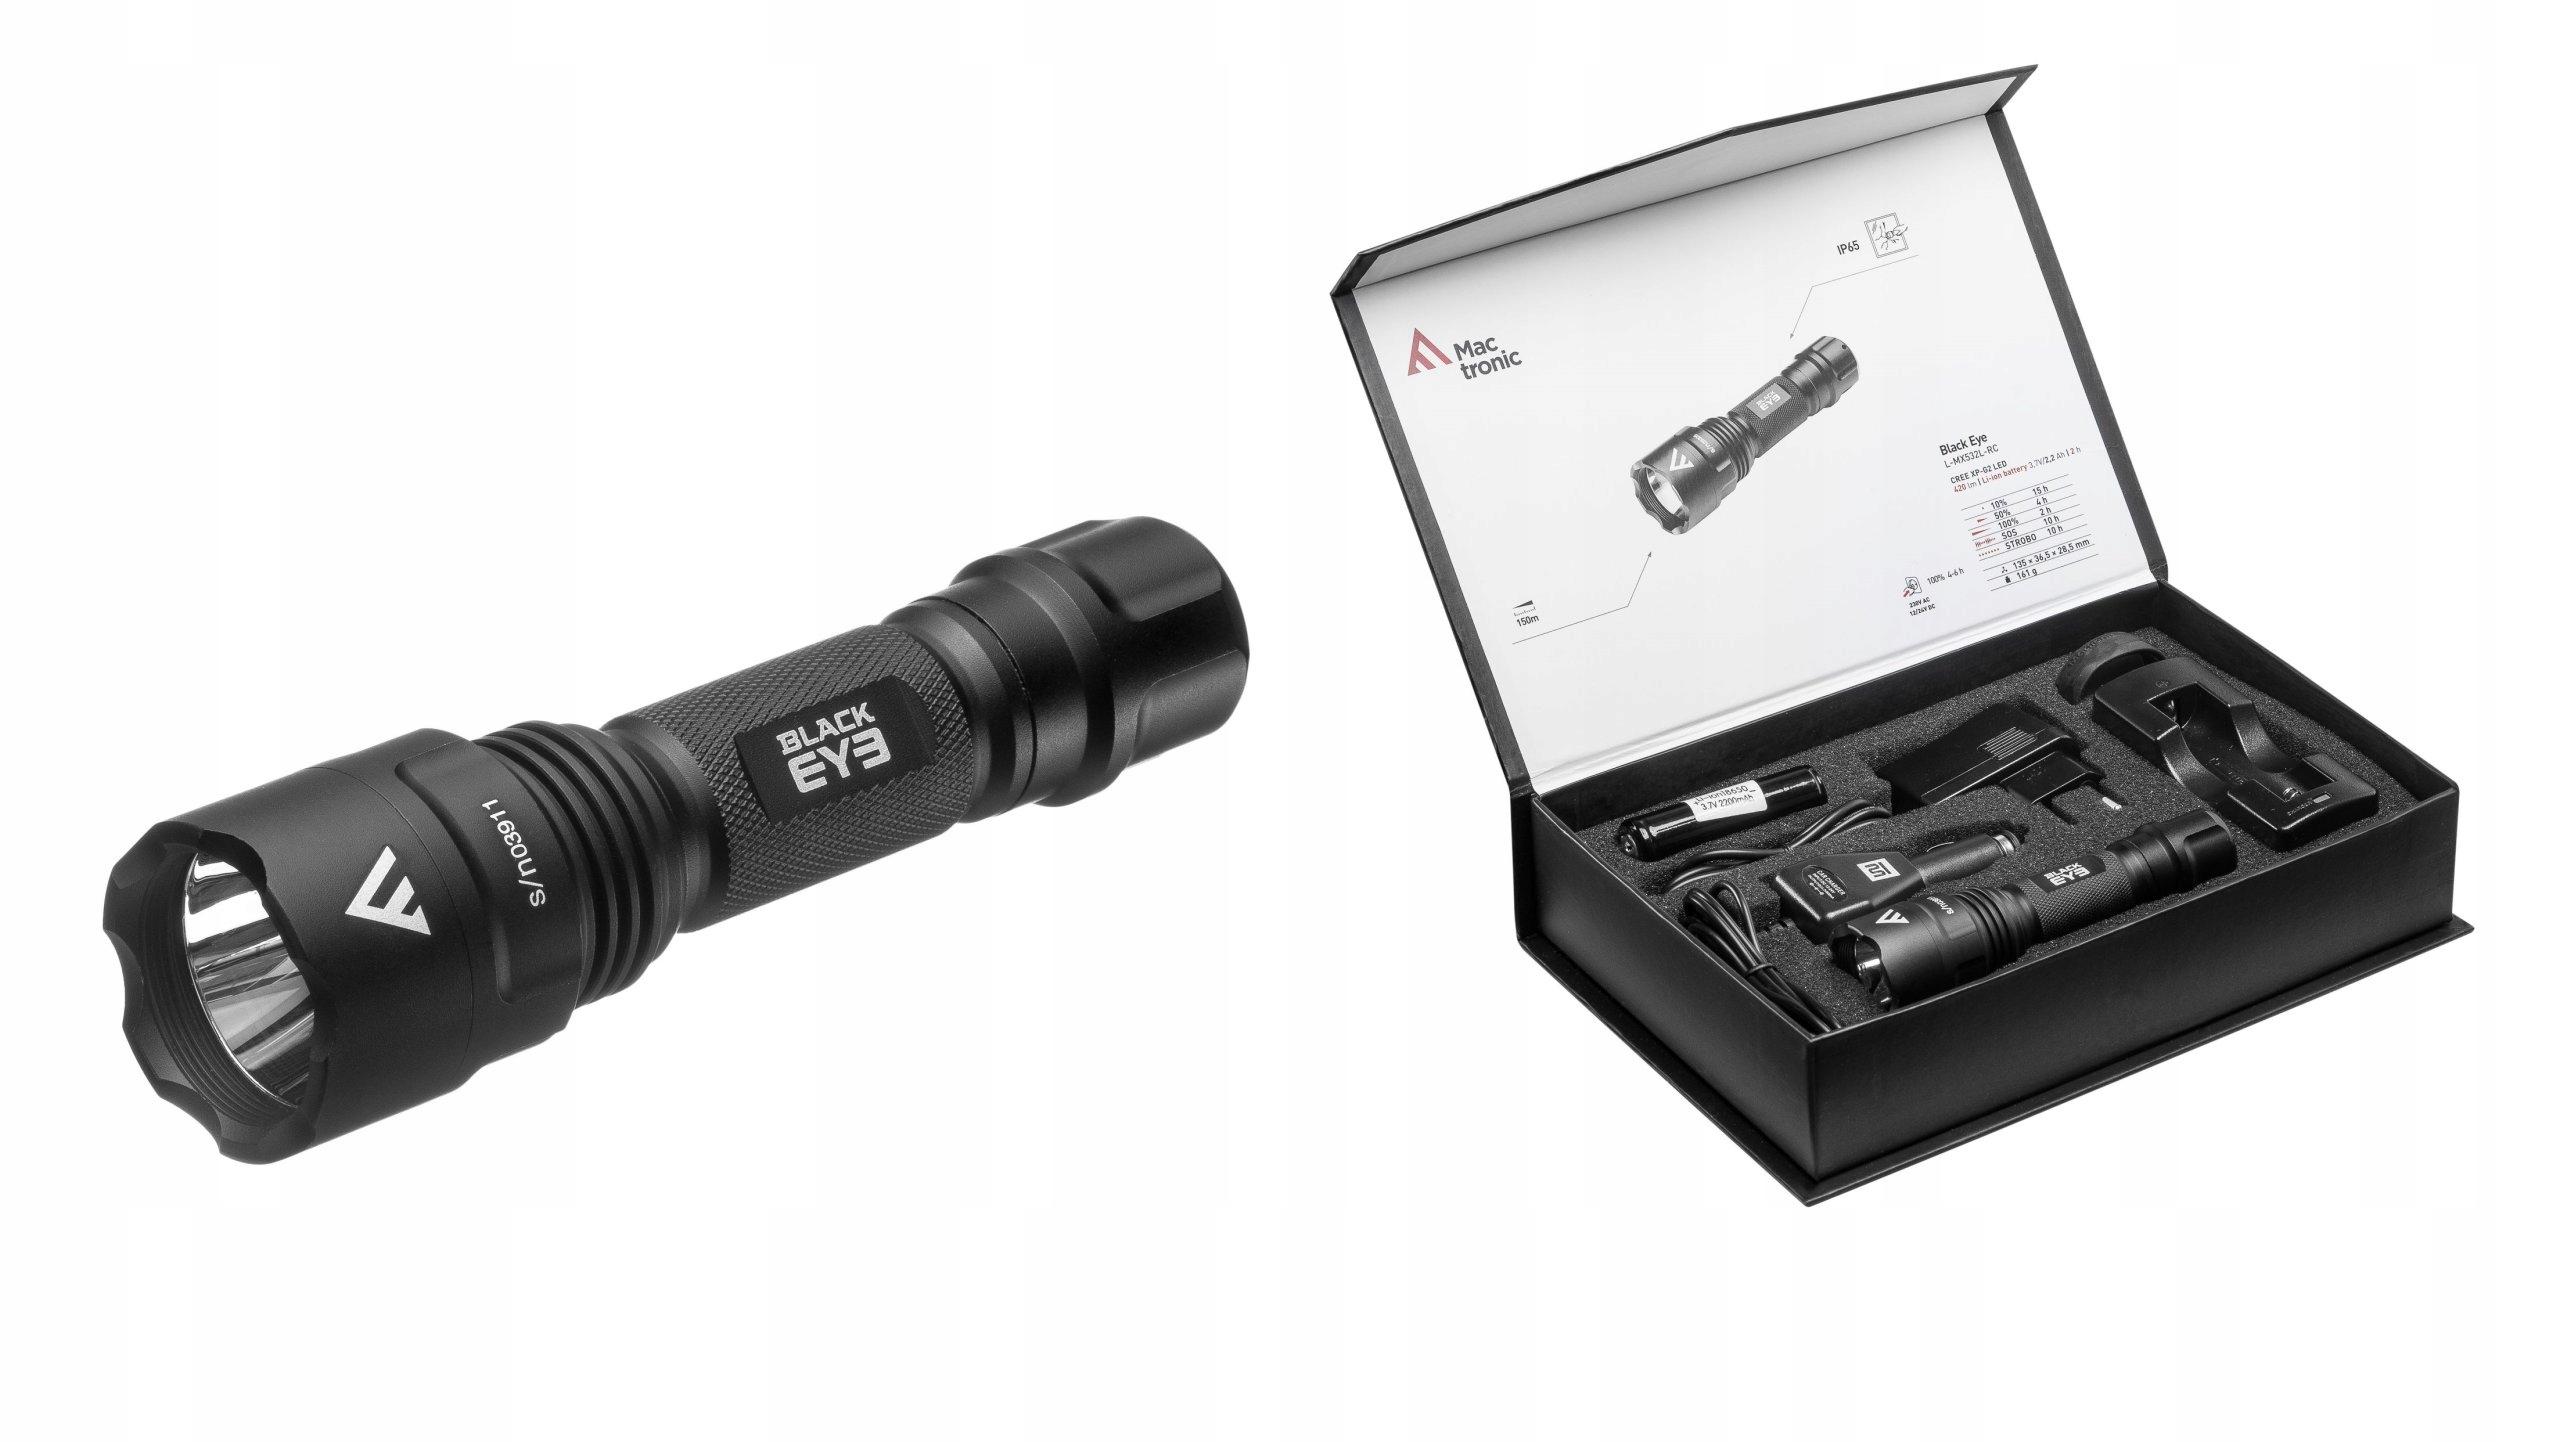 Baterka MACTRONIC Black Eye MX532L-RC 420lm